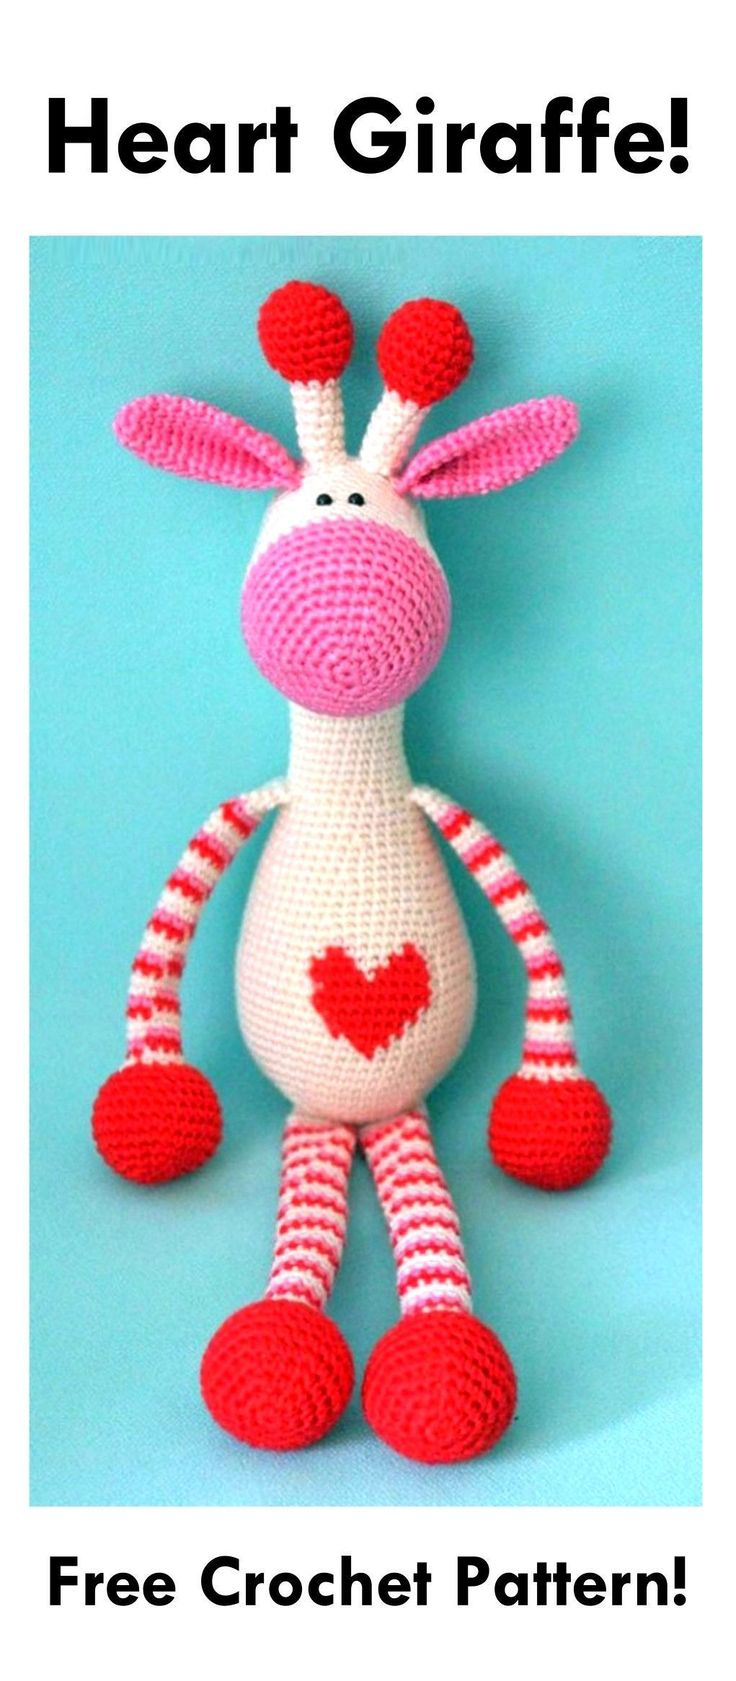 valentine giraffe Crochet Patterns, Amigurumi valentine giraffe Crochet, valentine giraffe crochet pattern, valentine giraffe crochet, valentine giraffe amigurumi, valentine giraffe Crochet doll, crochet valentine giraffe Amigurumi, handmade valentine giraffe Amigurumi present, handmade valentine giraffe present, valentine giraffe crochet toy, valentine giraffe amigurumi doll,; #CrochetValentines #crochettoys